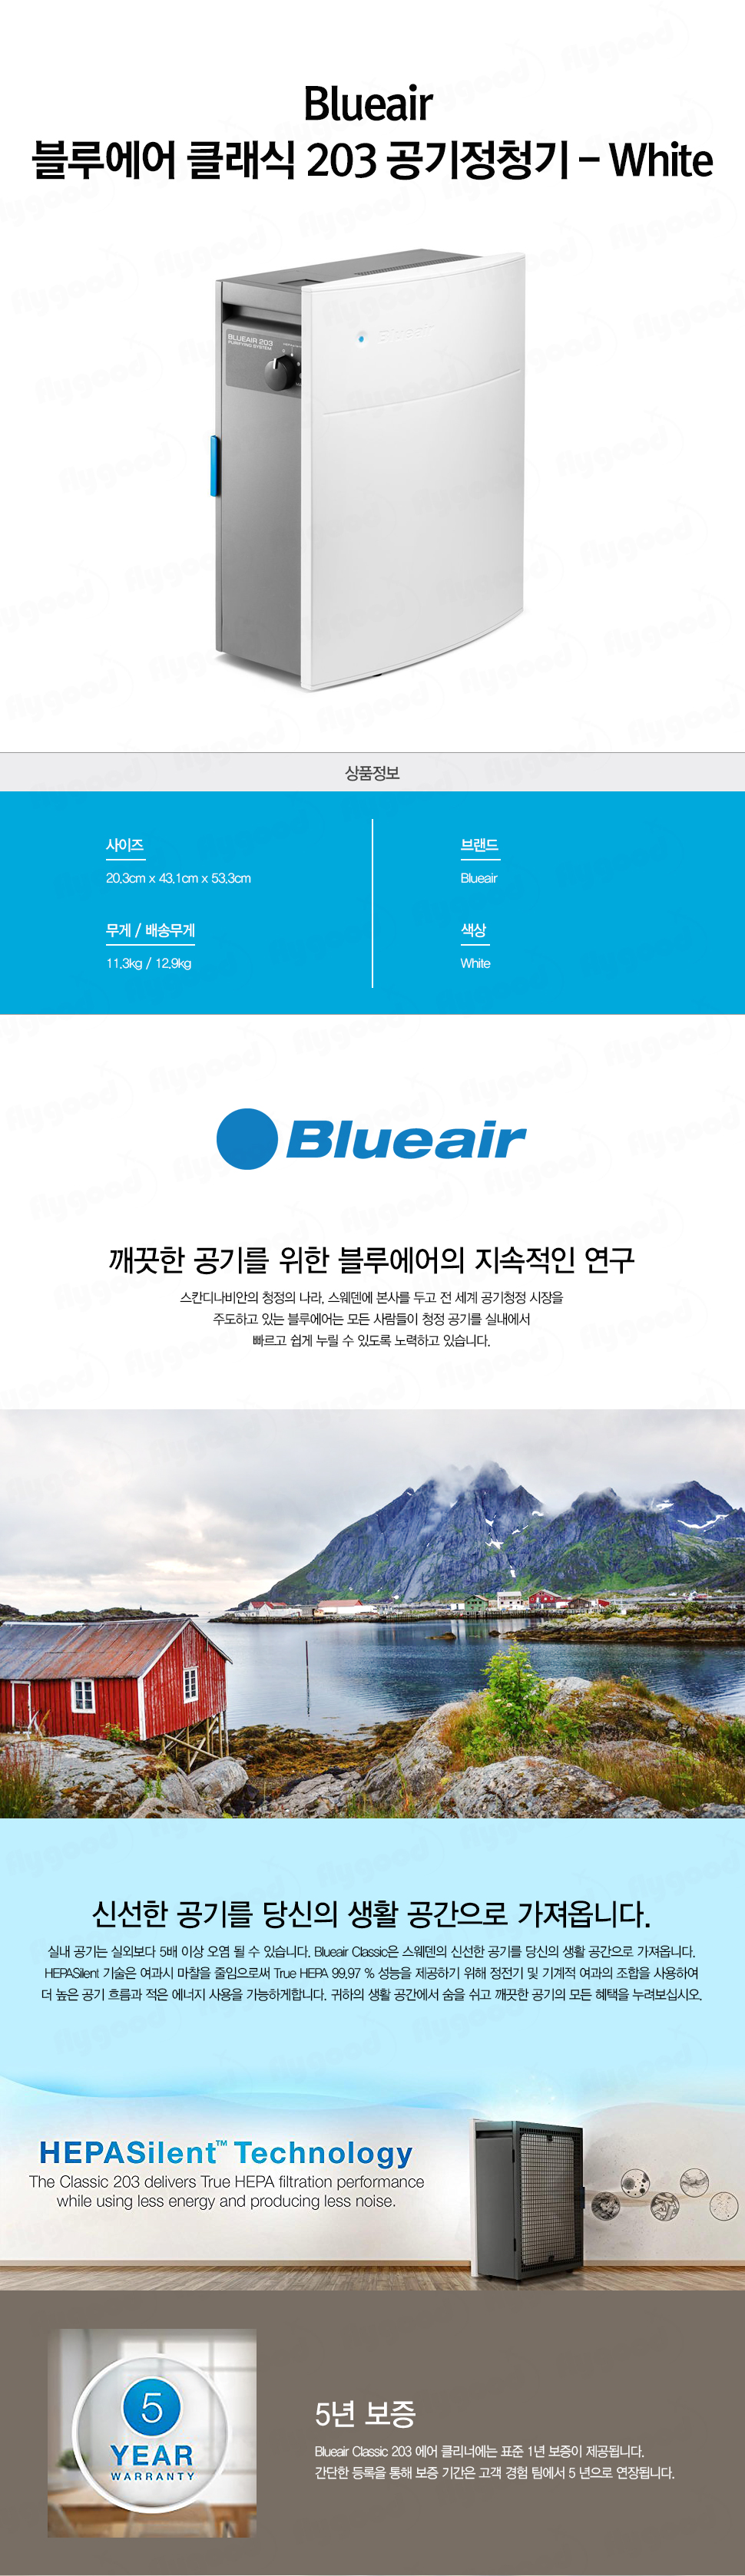 Blueair_클래식_203_공기청정기_White_01.jpg